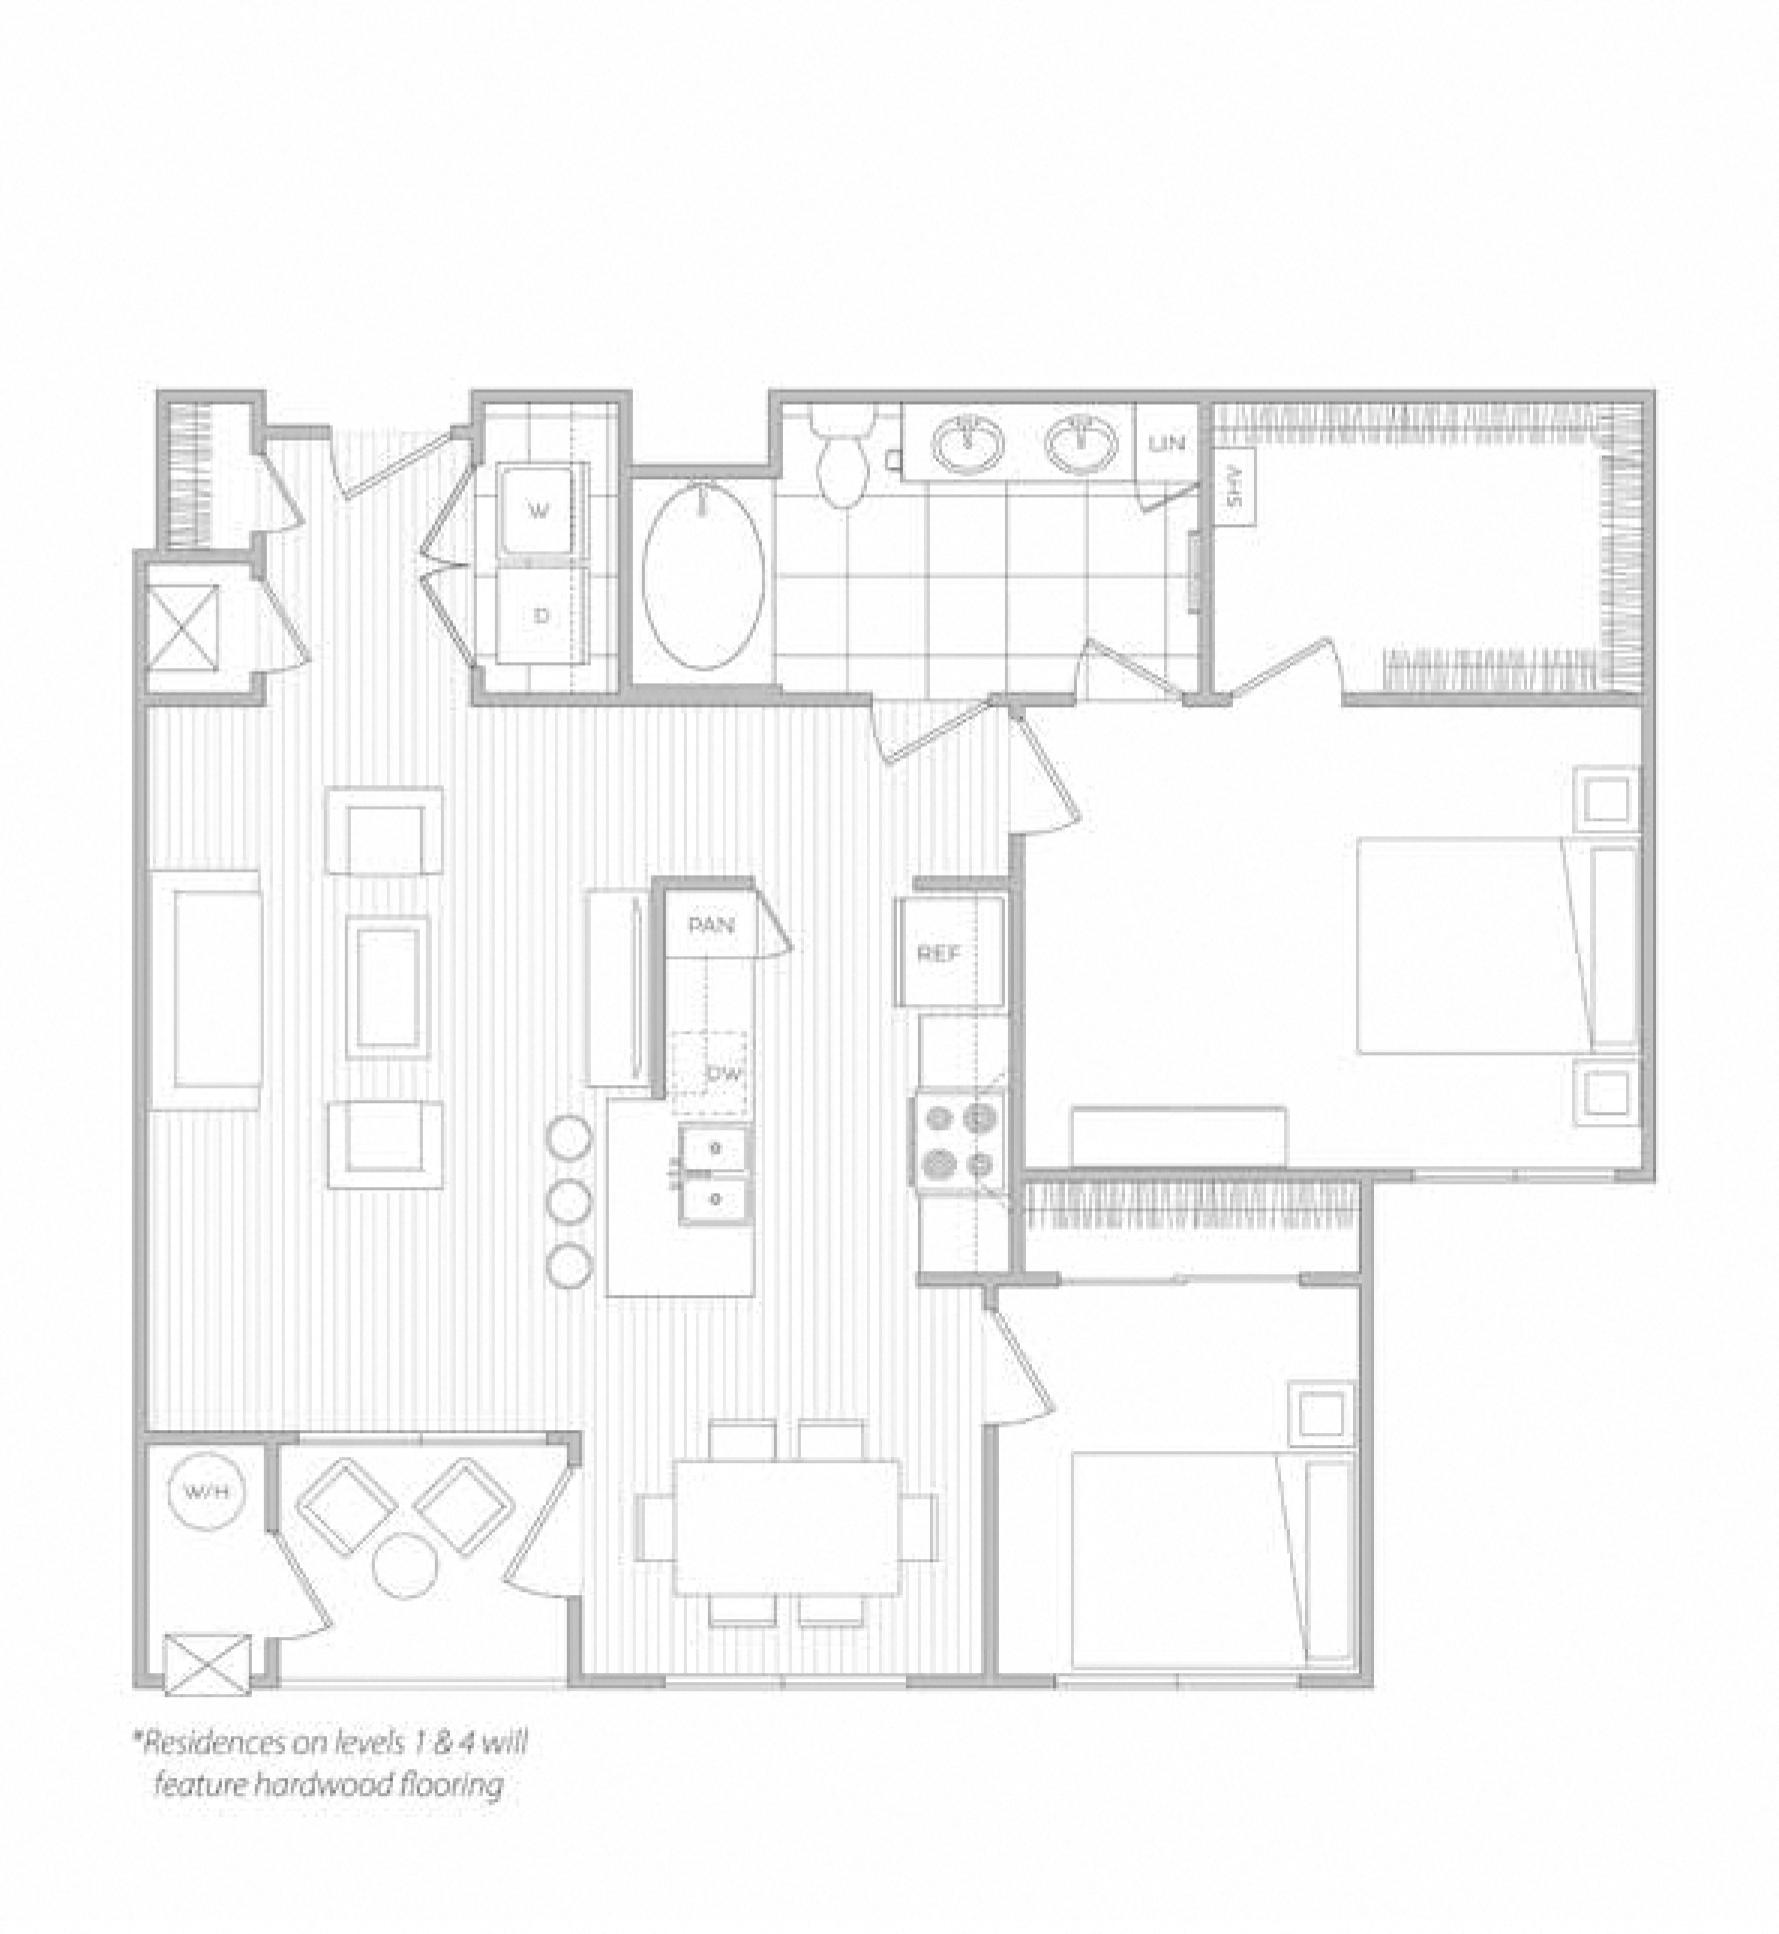 floor plan image of apartment 5203